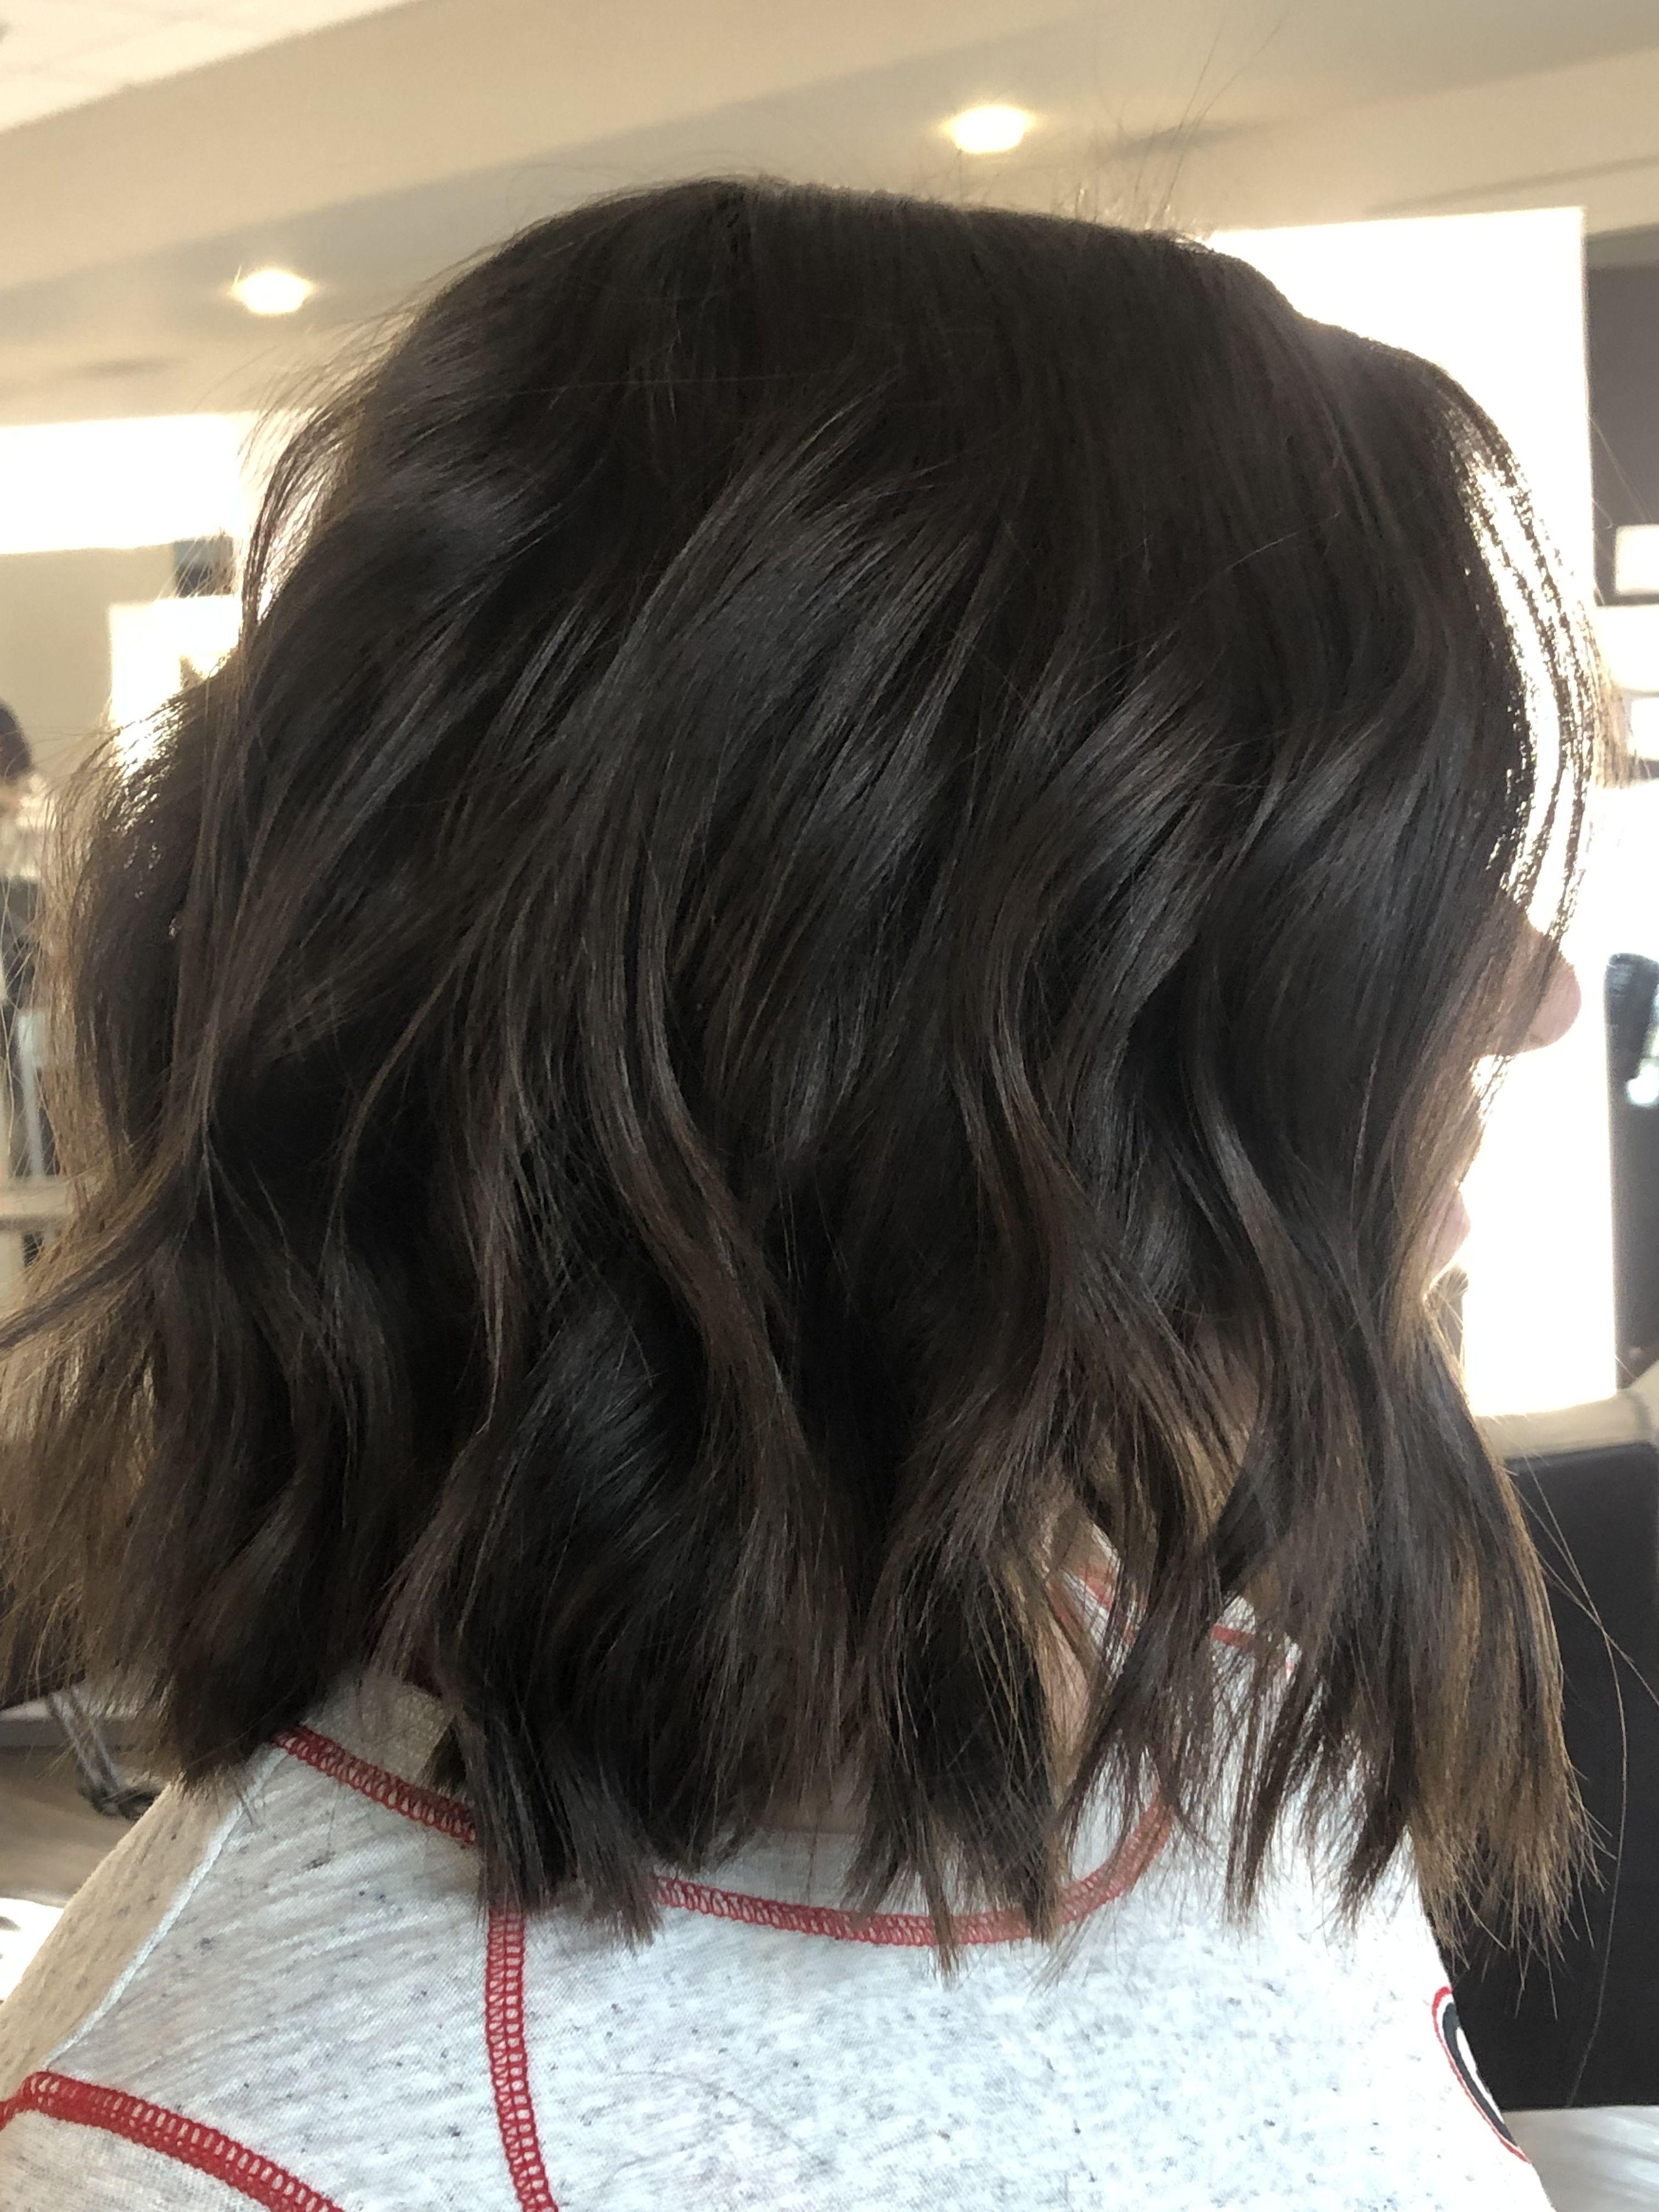 Short Dark Brown Bob Beach Waves Short Hair Waves Short Dark Brown Hair Dark Hair